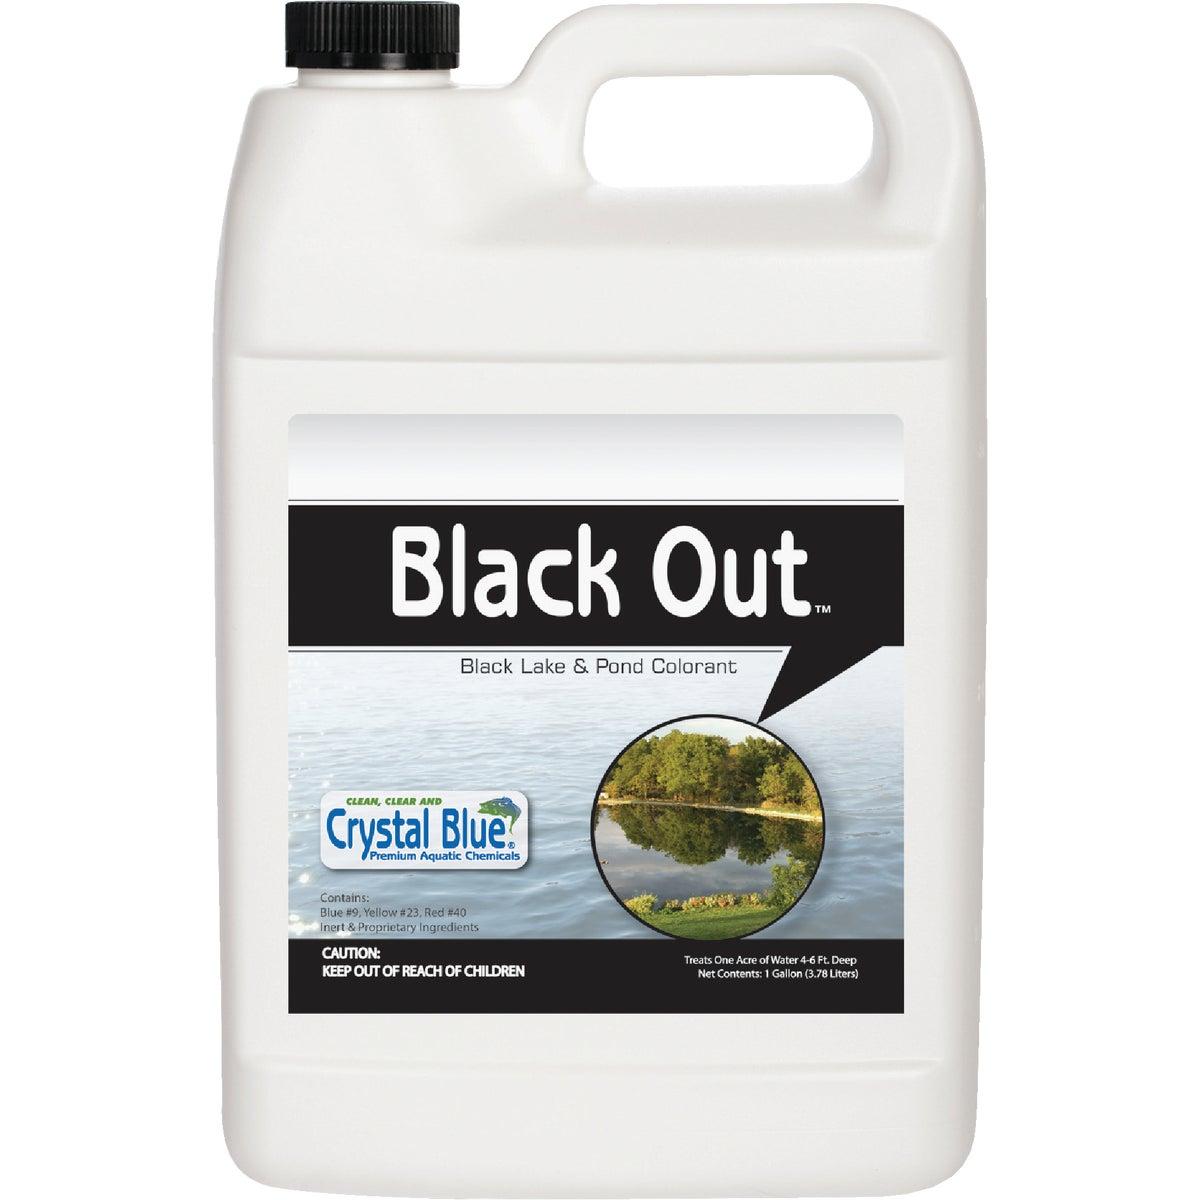 BLACK OUT POND COLORANT